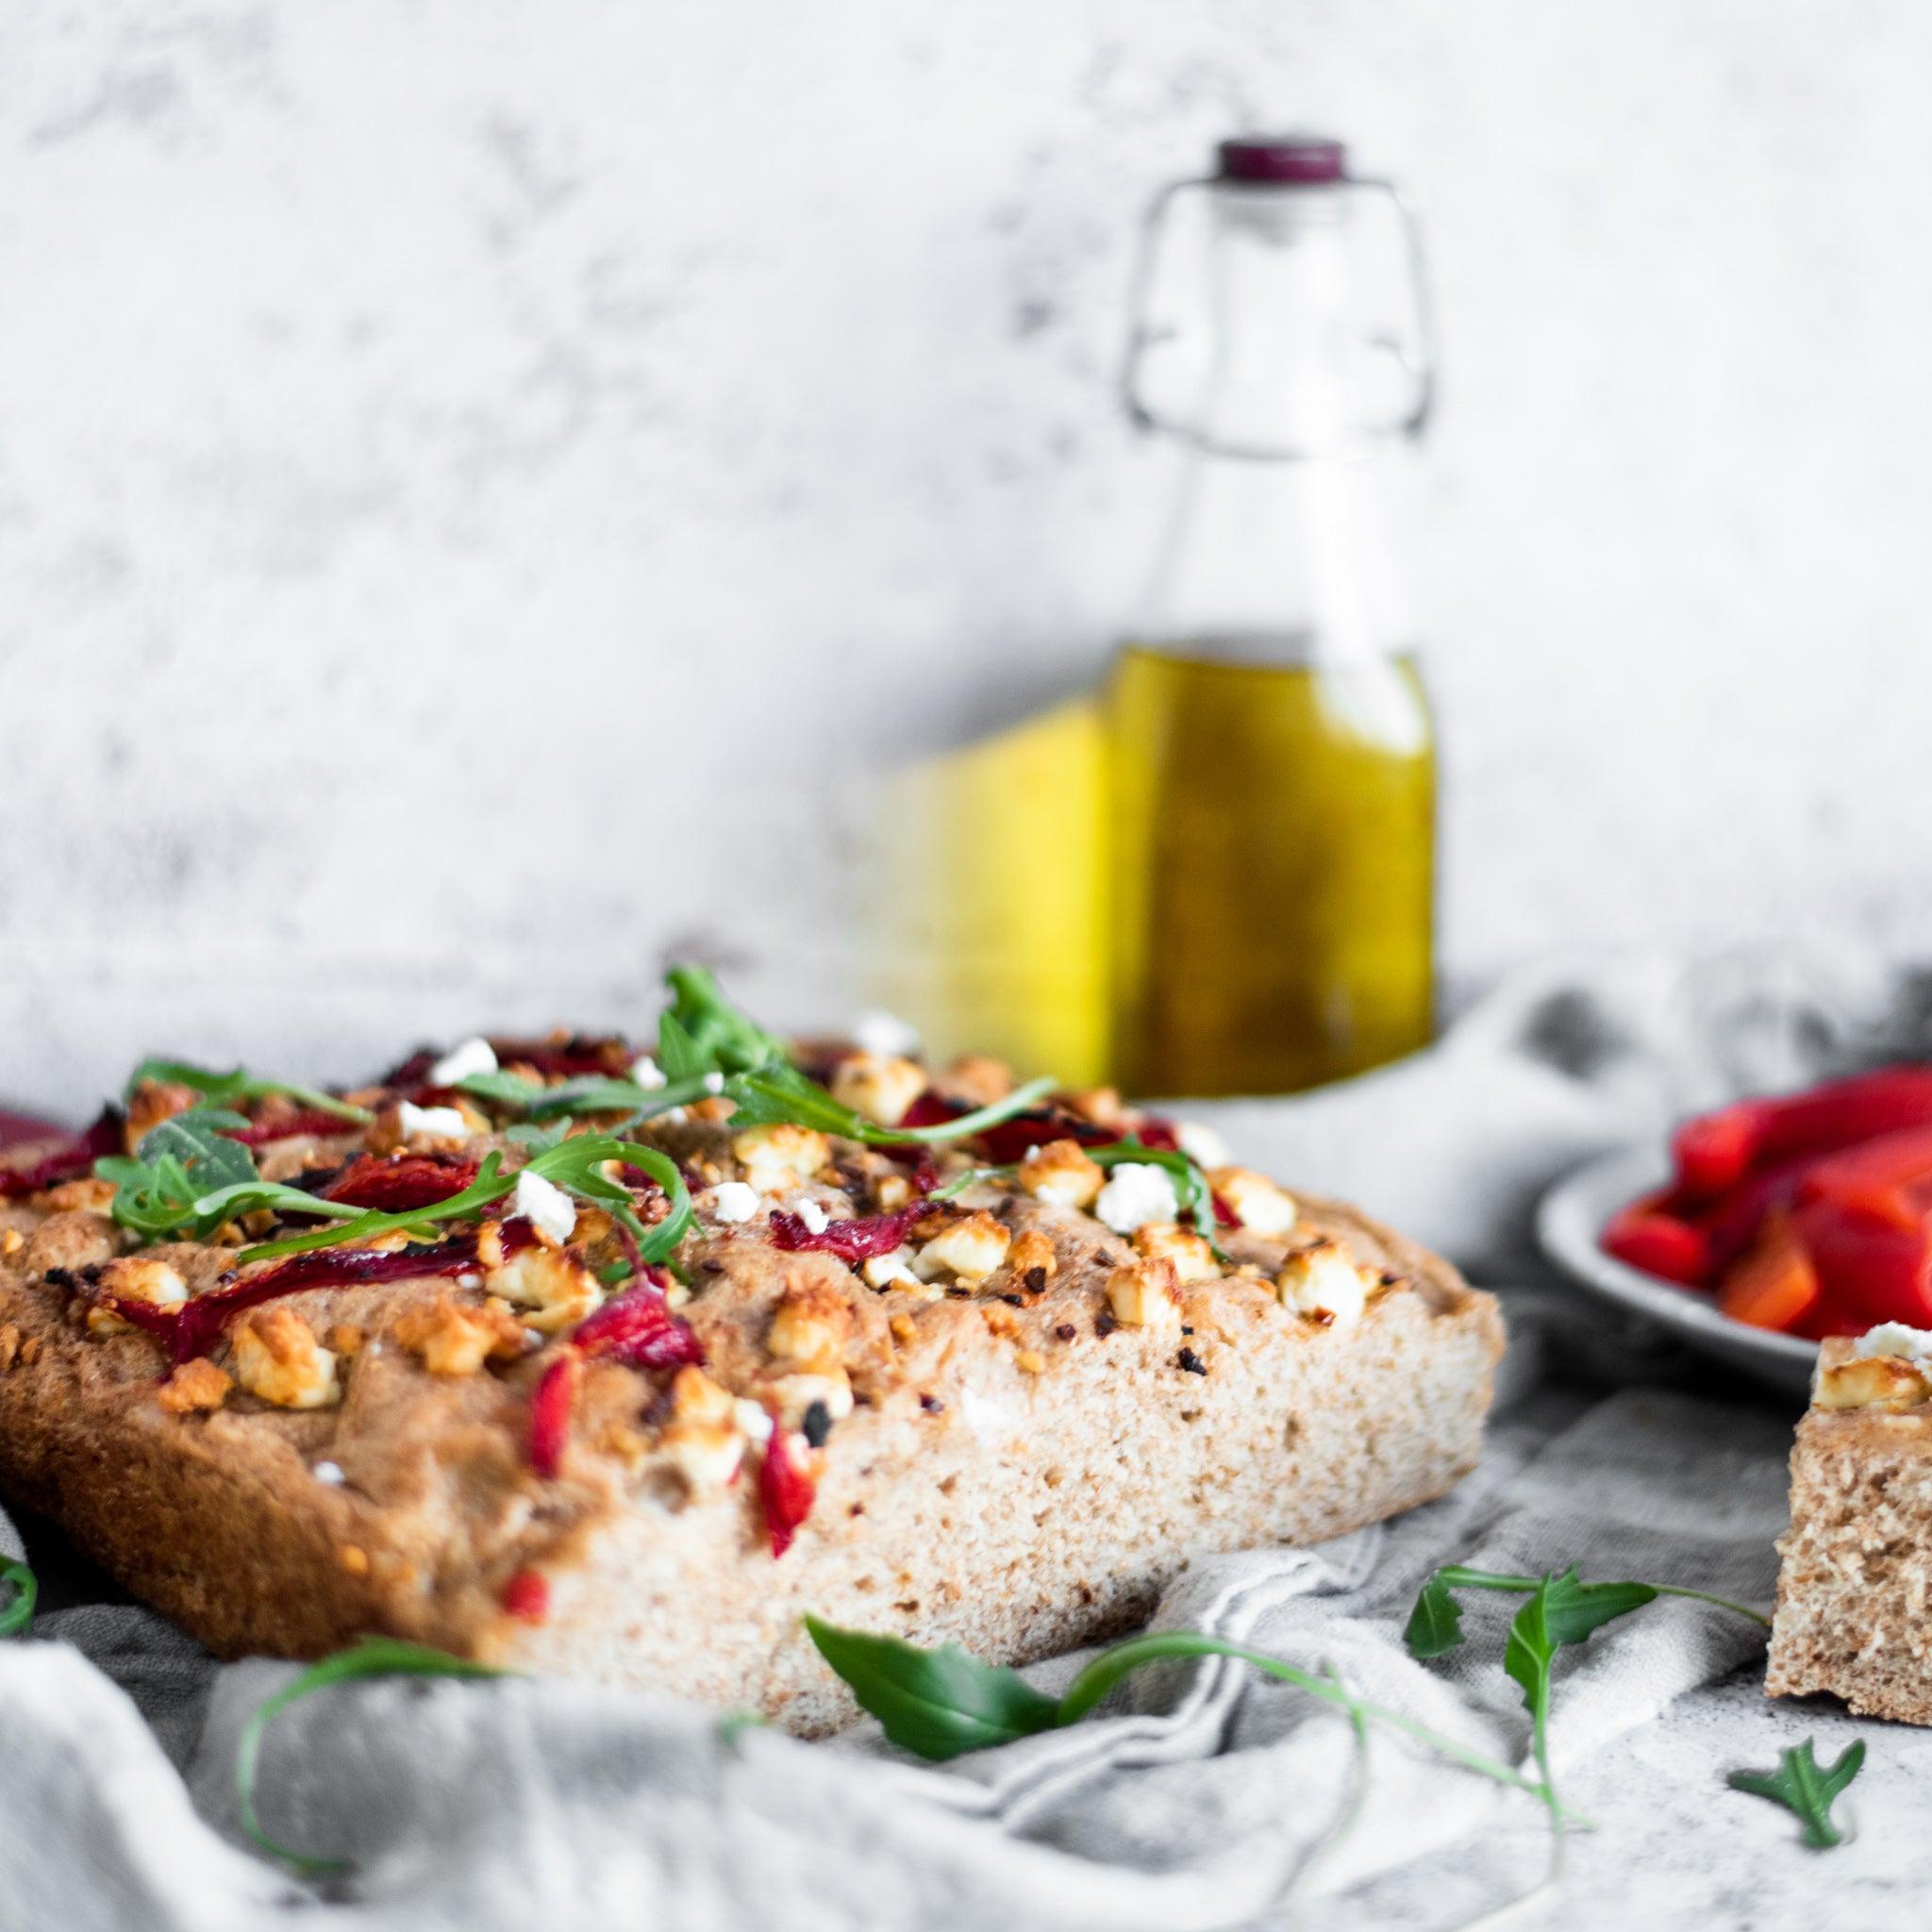 Chilli-Pepper-Feta-Bread-by-Allinson-s-(8).jpg